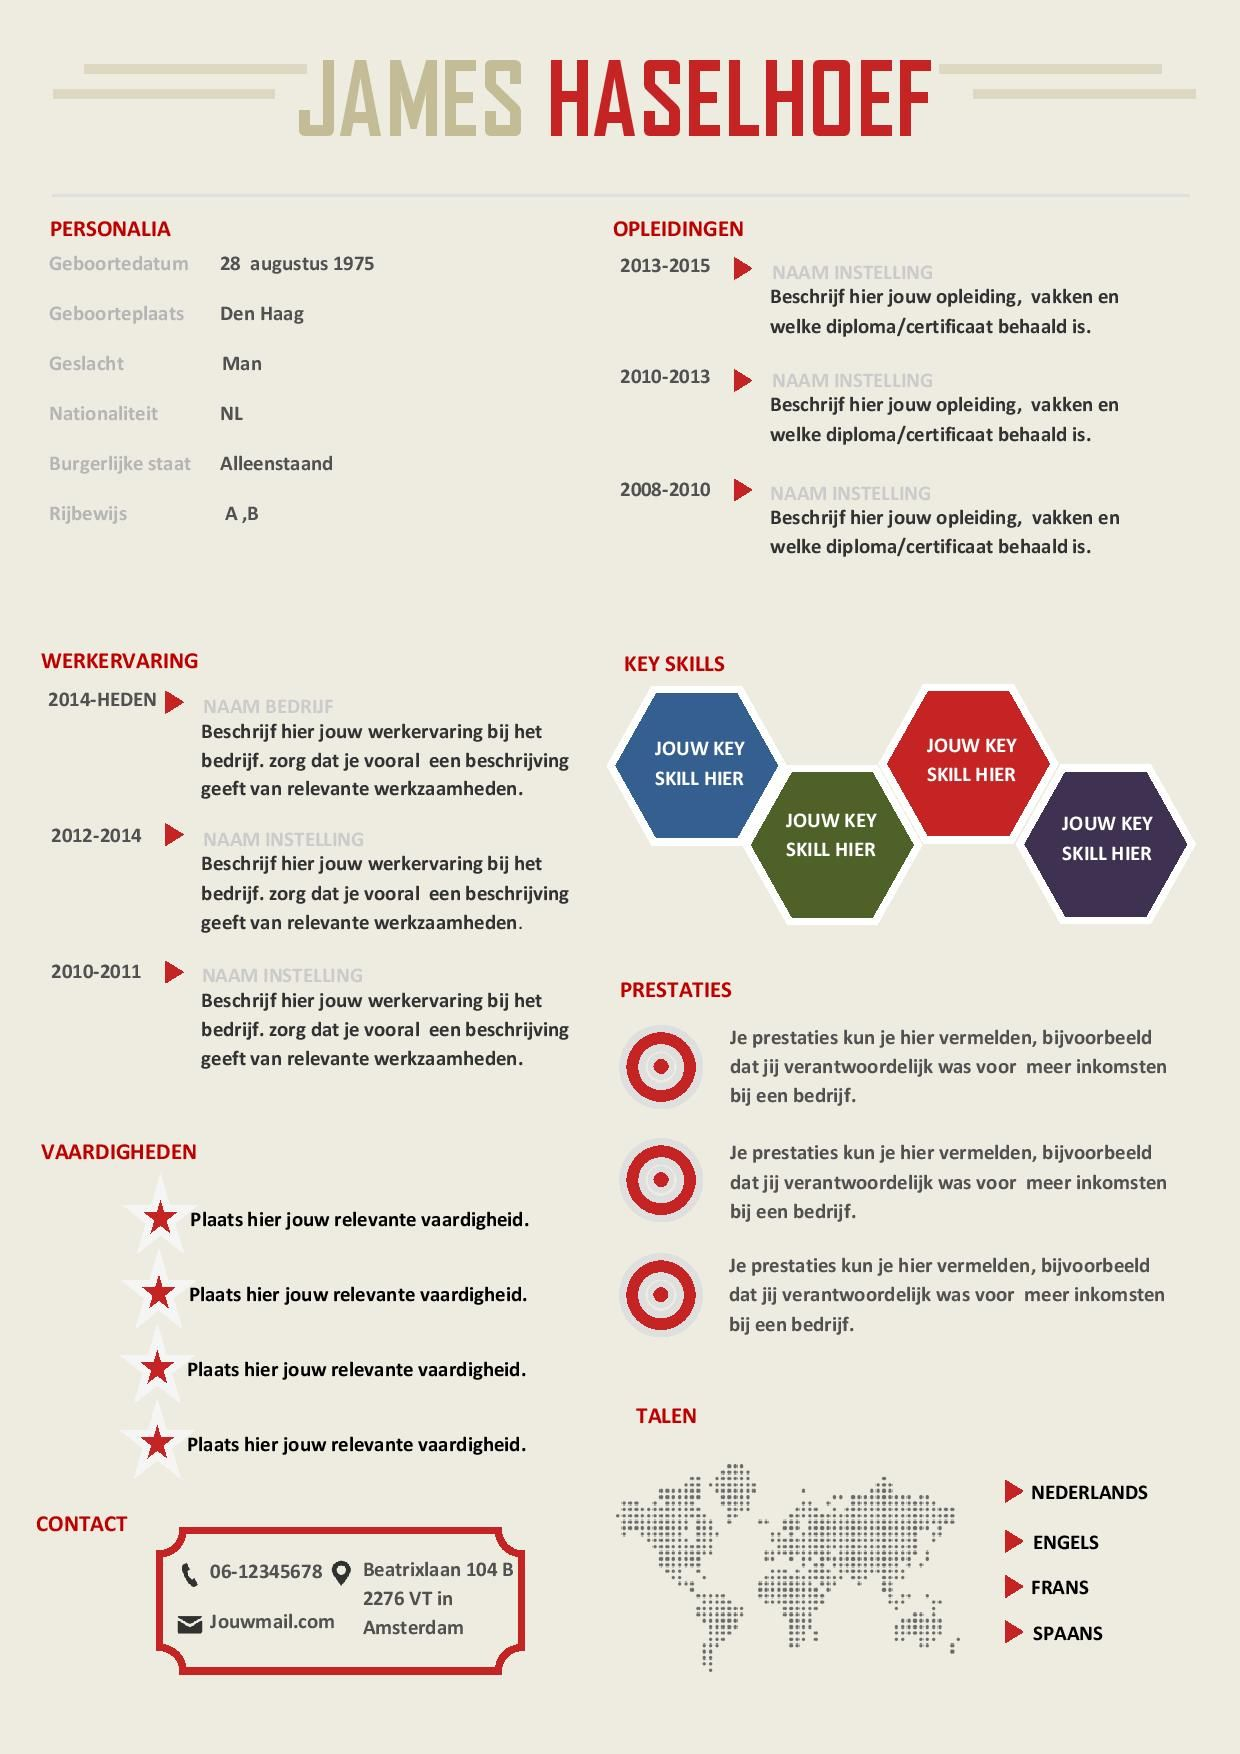 creatieve motivatiebrief Modern en creatief cv met motivatiebrief | Moderne Cv's en  creatieve motivatiebrief